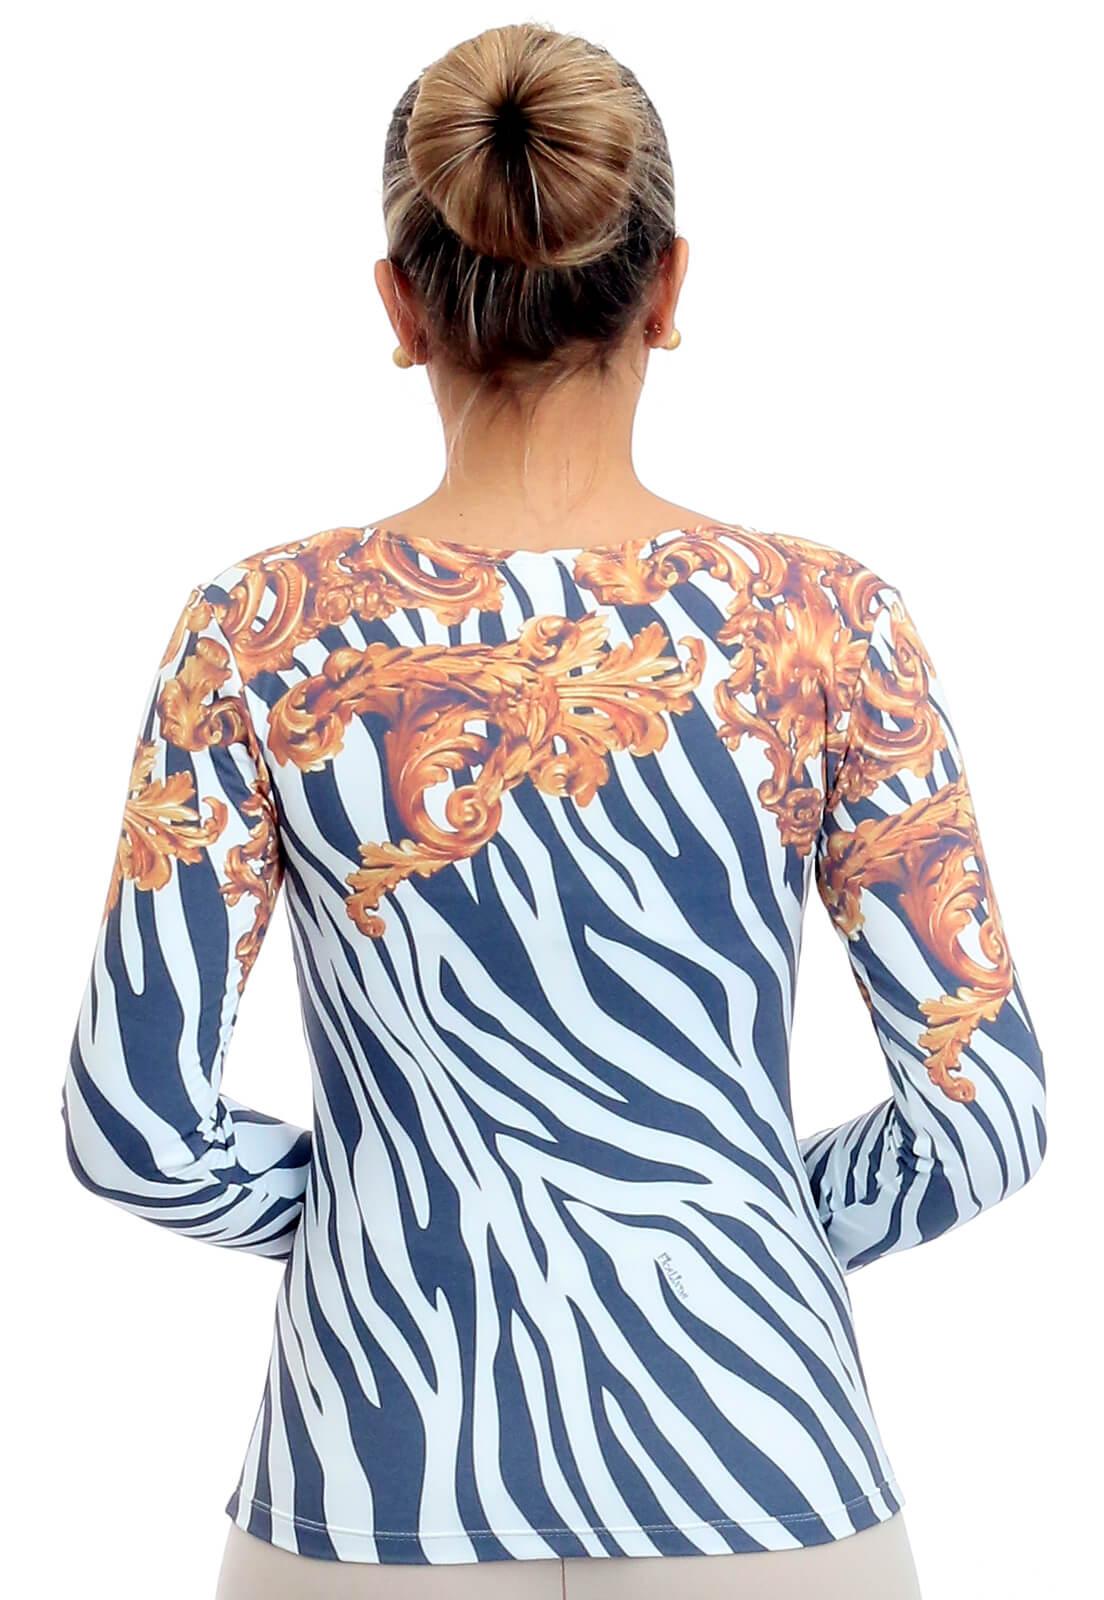 Blusa Feminina Manga Longa Estampa Exclusiva Zebra Barroco Decote Redondo